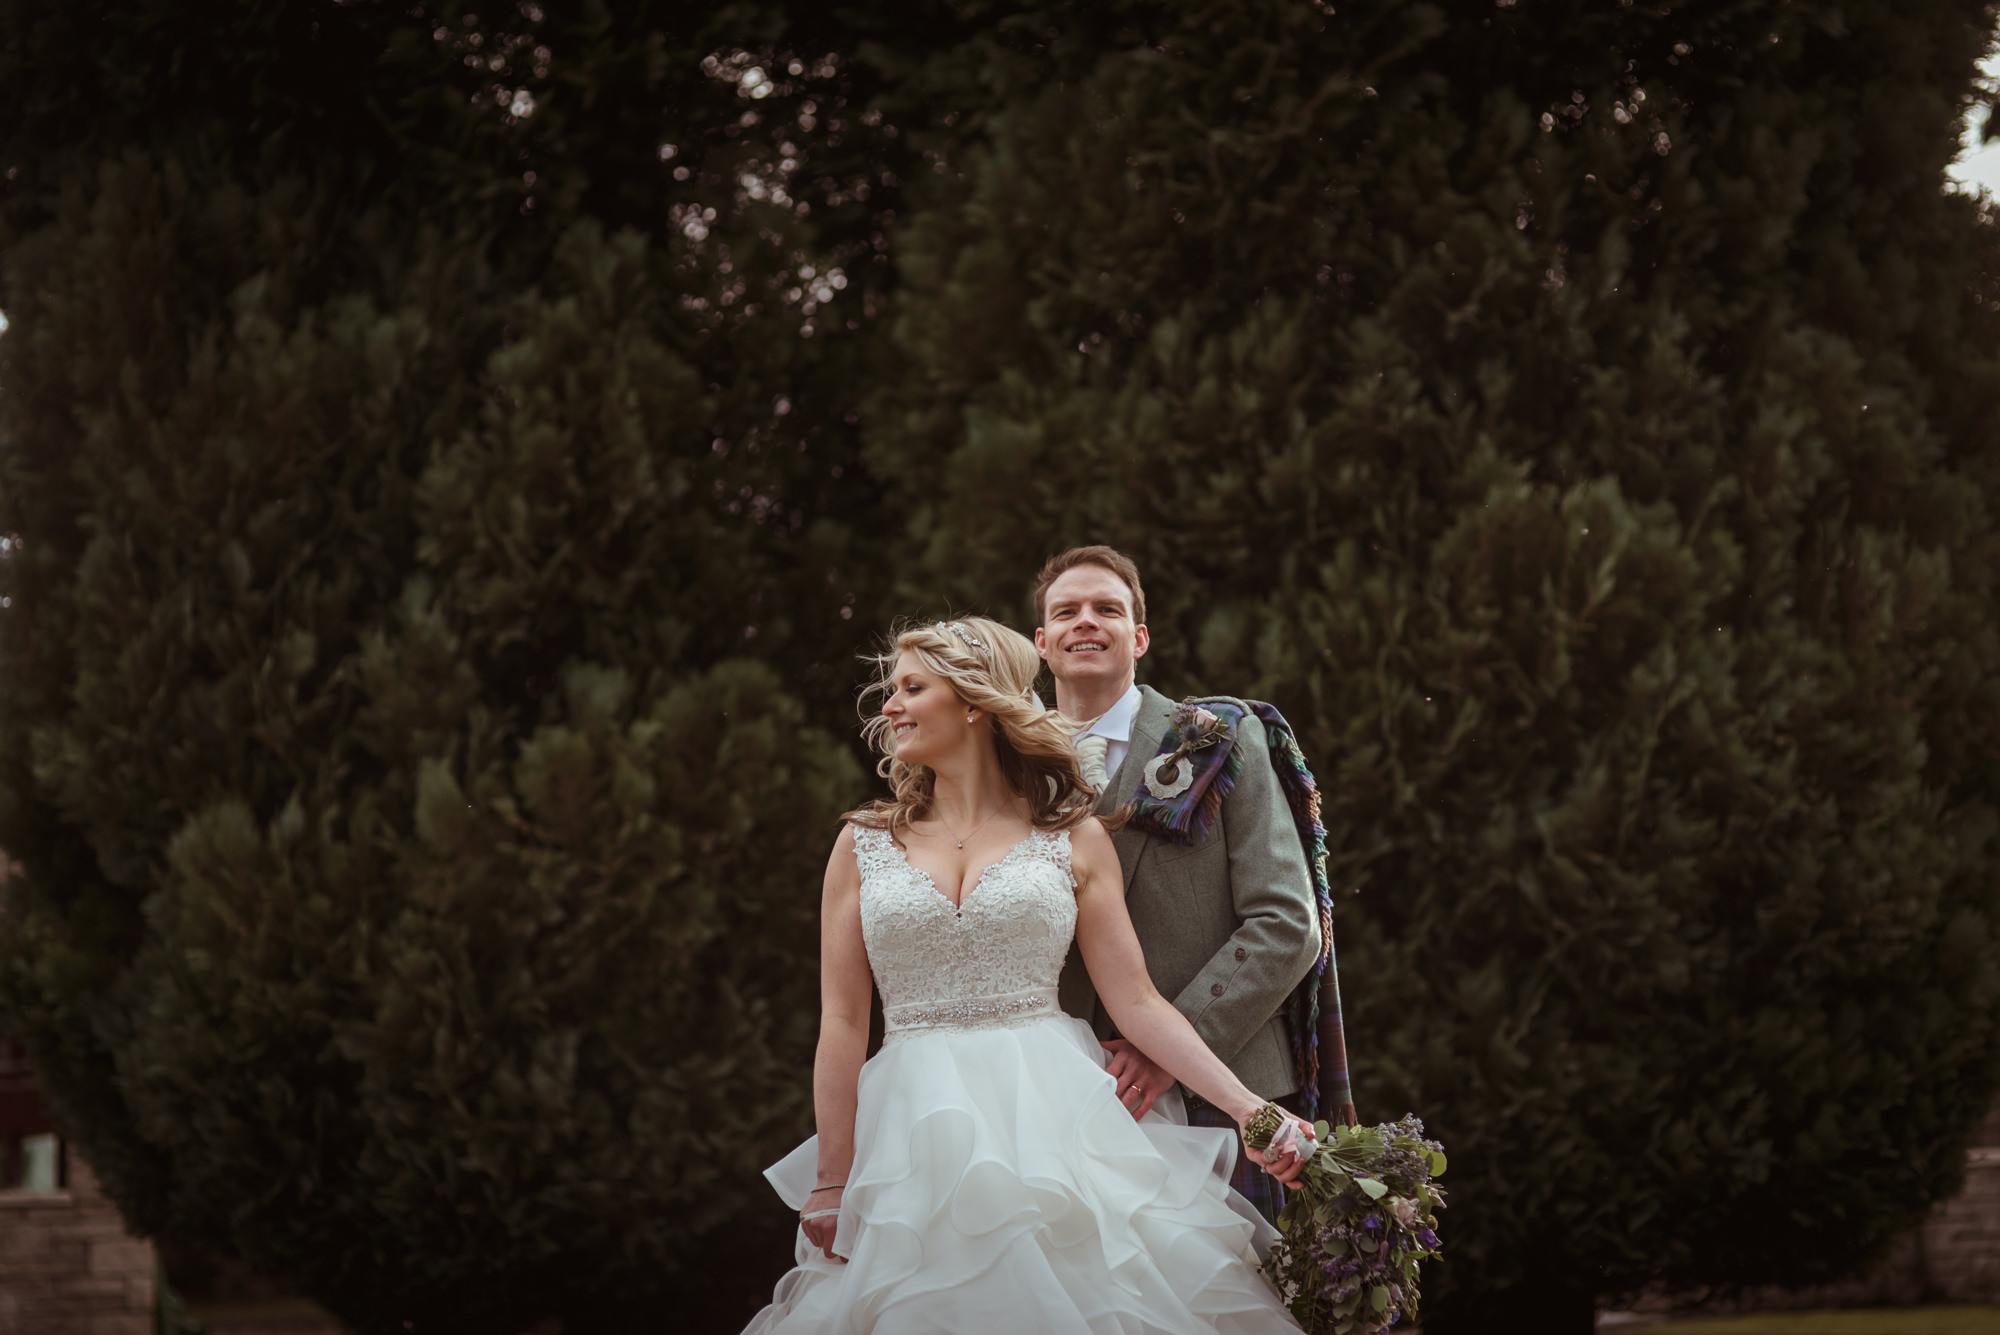 wedding-photography-cruin-alternative.jpg